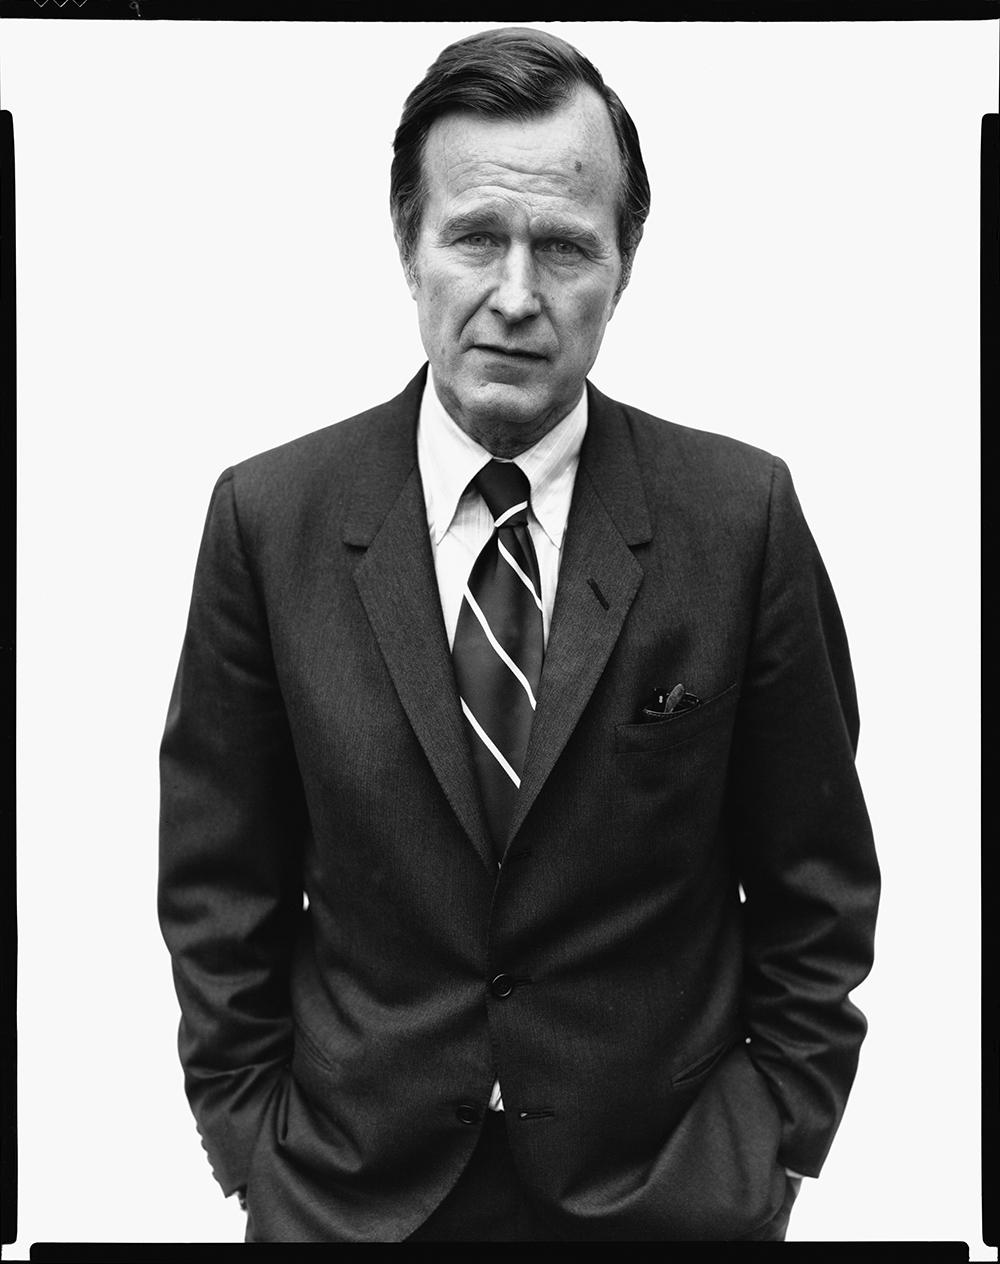 George-Bush,-Director,-CIA,-Langley,-Virginia,-March-2,-1976,-109.1.38_Final